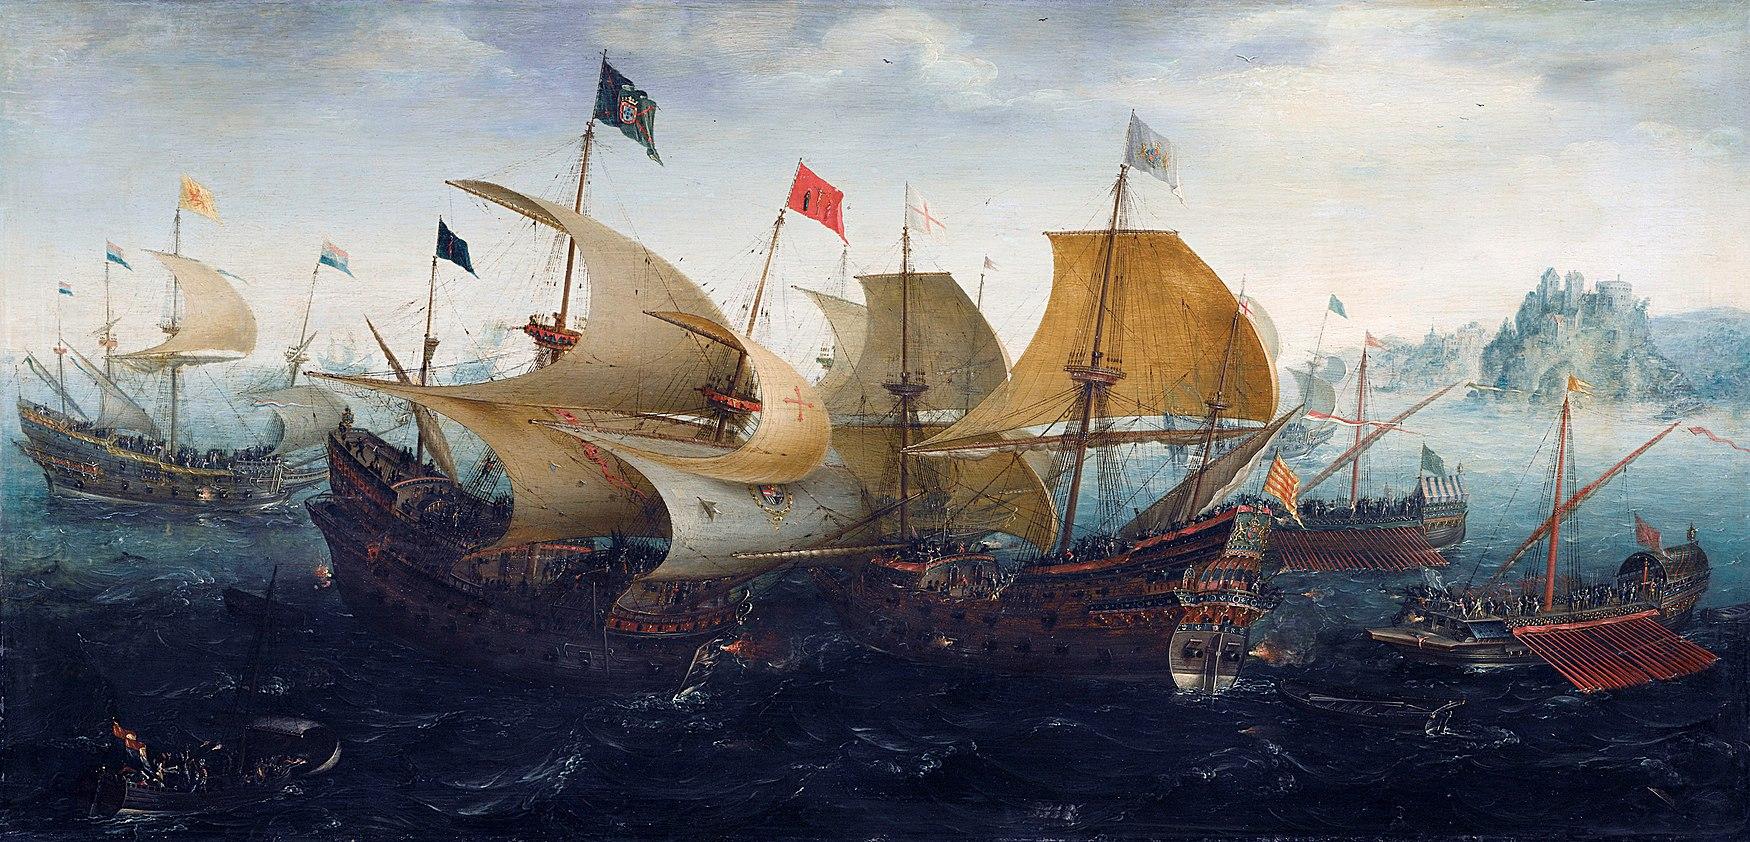 Hms Warspite 1596 Wikivisually